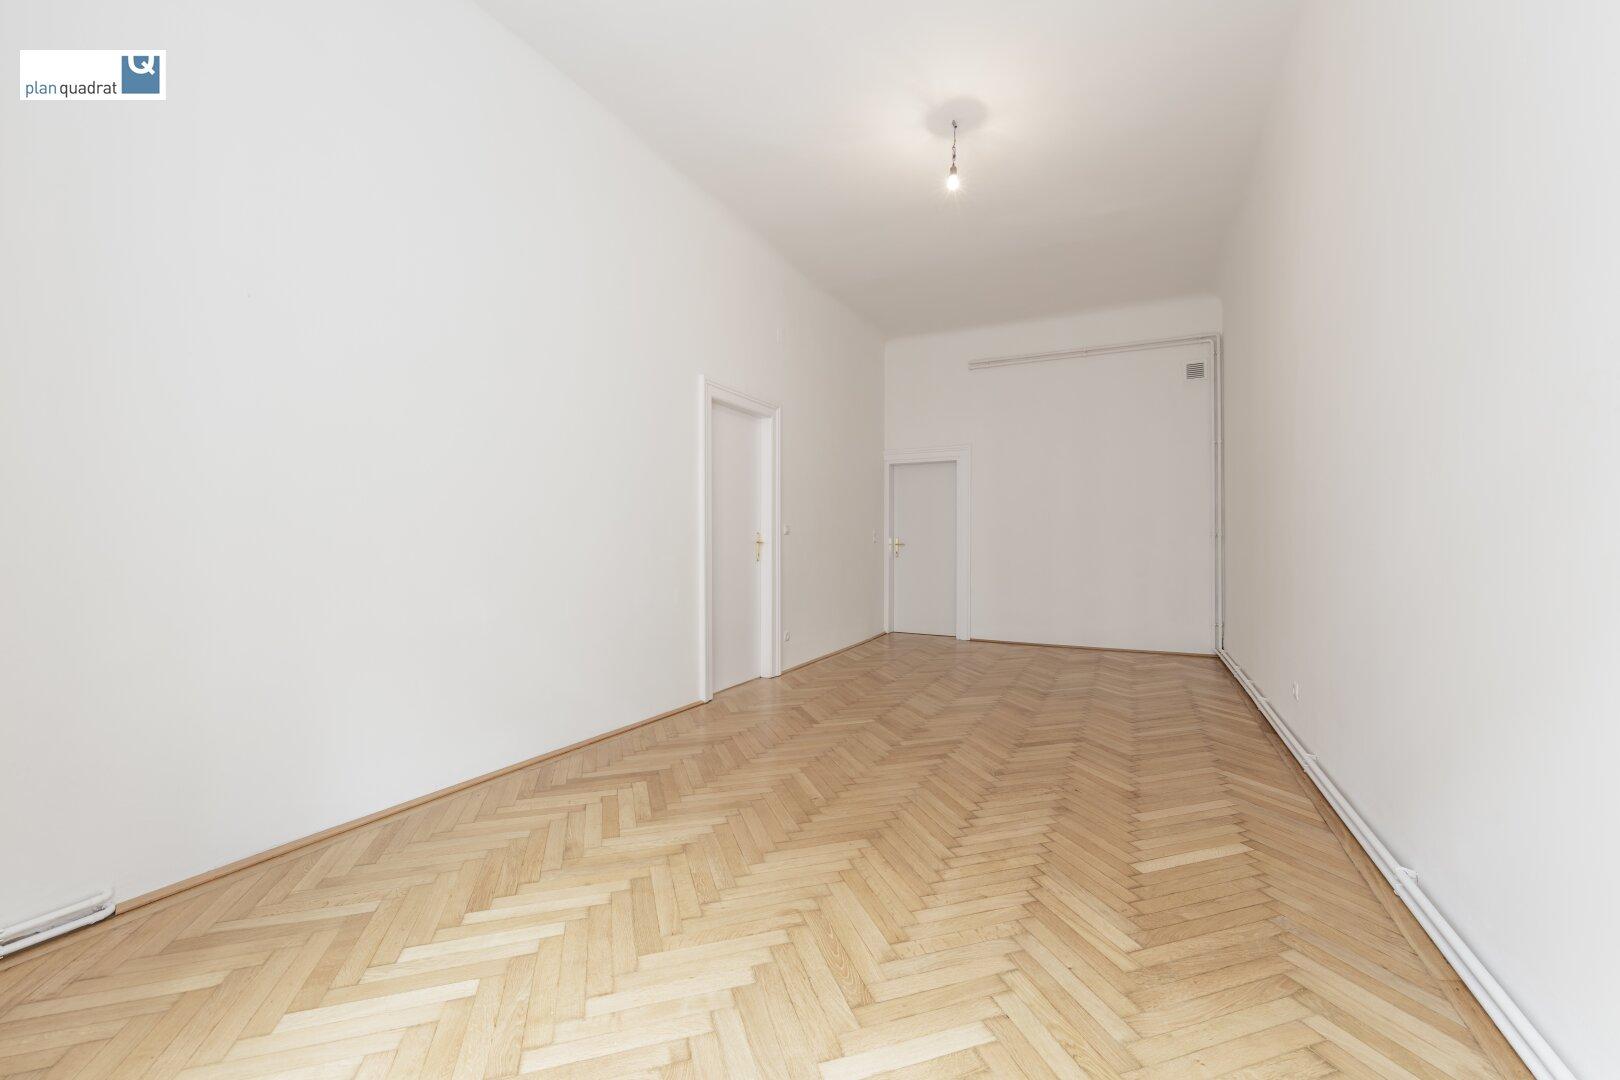 Büroraum 1 (gem. Grundriss - ca. 24,90 qm)